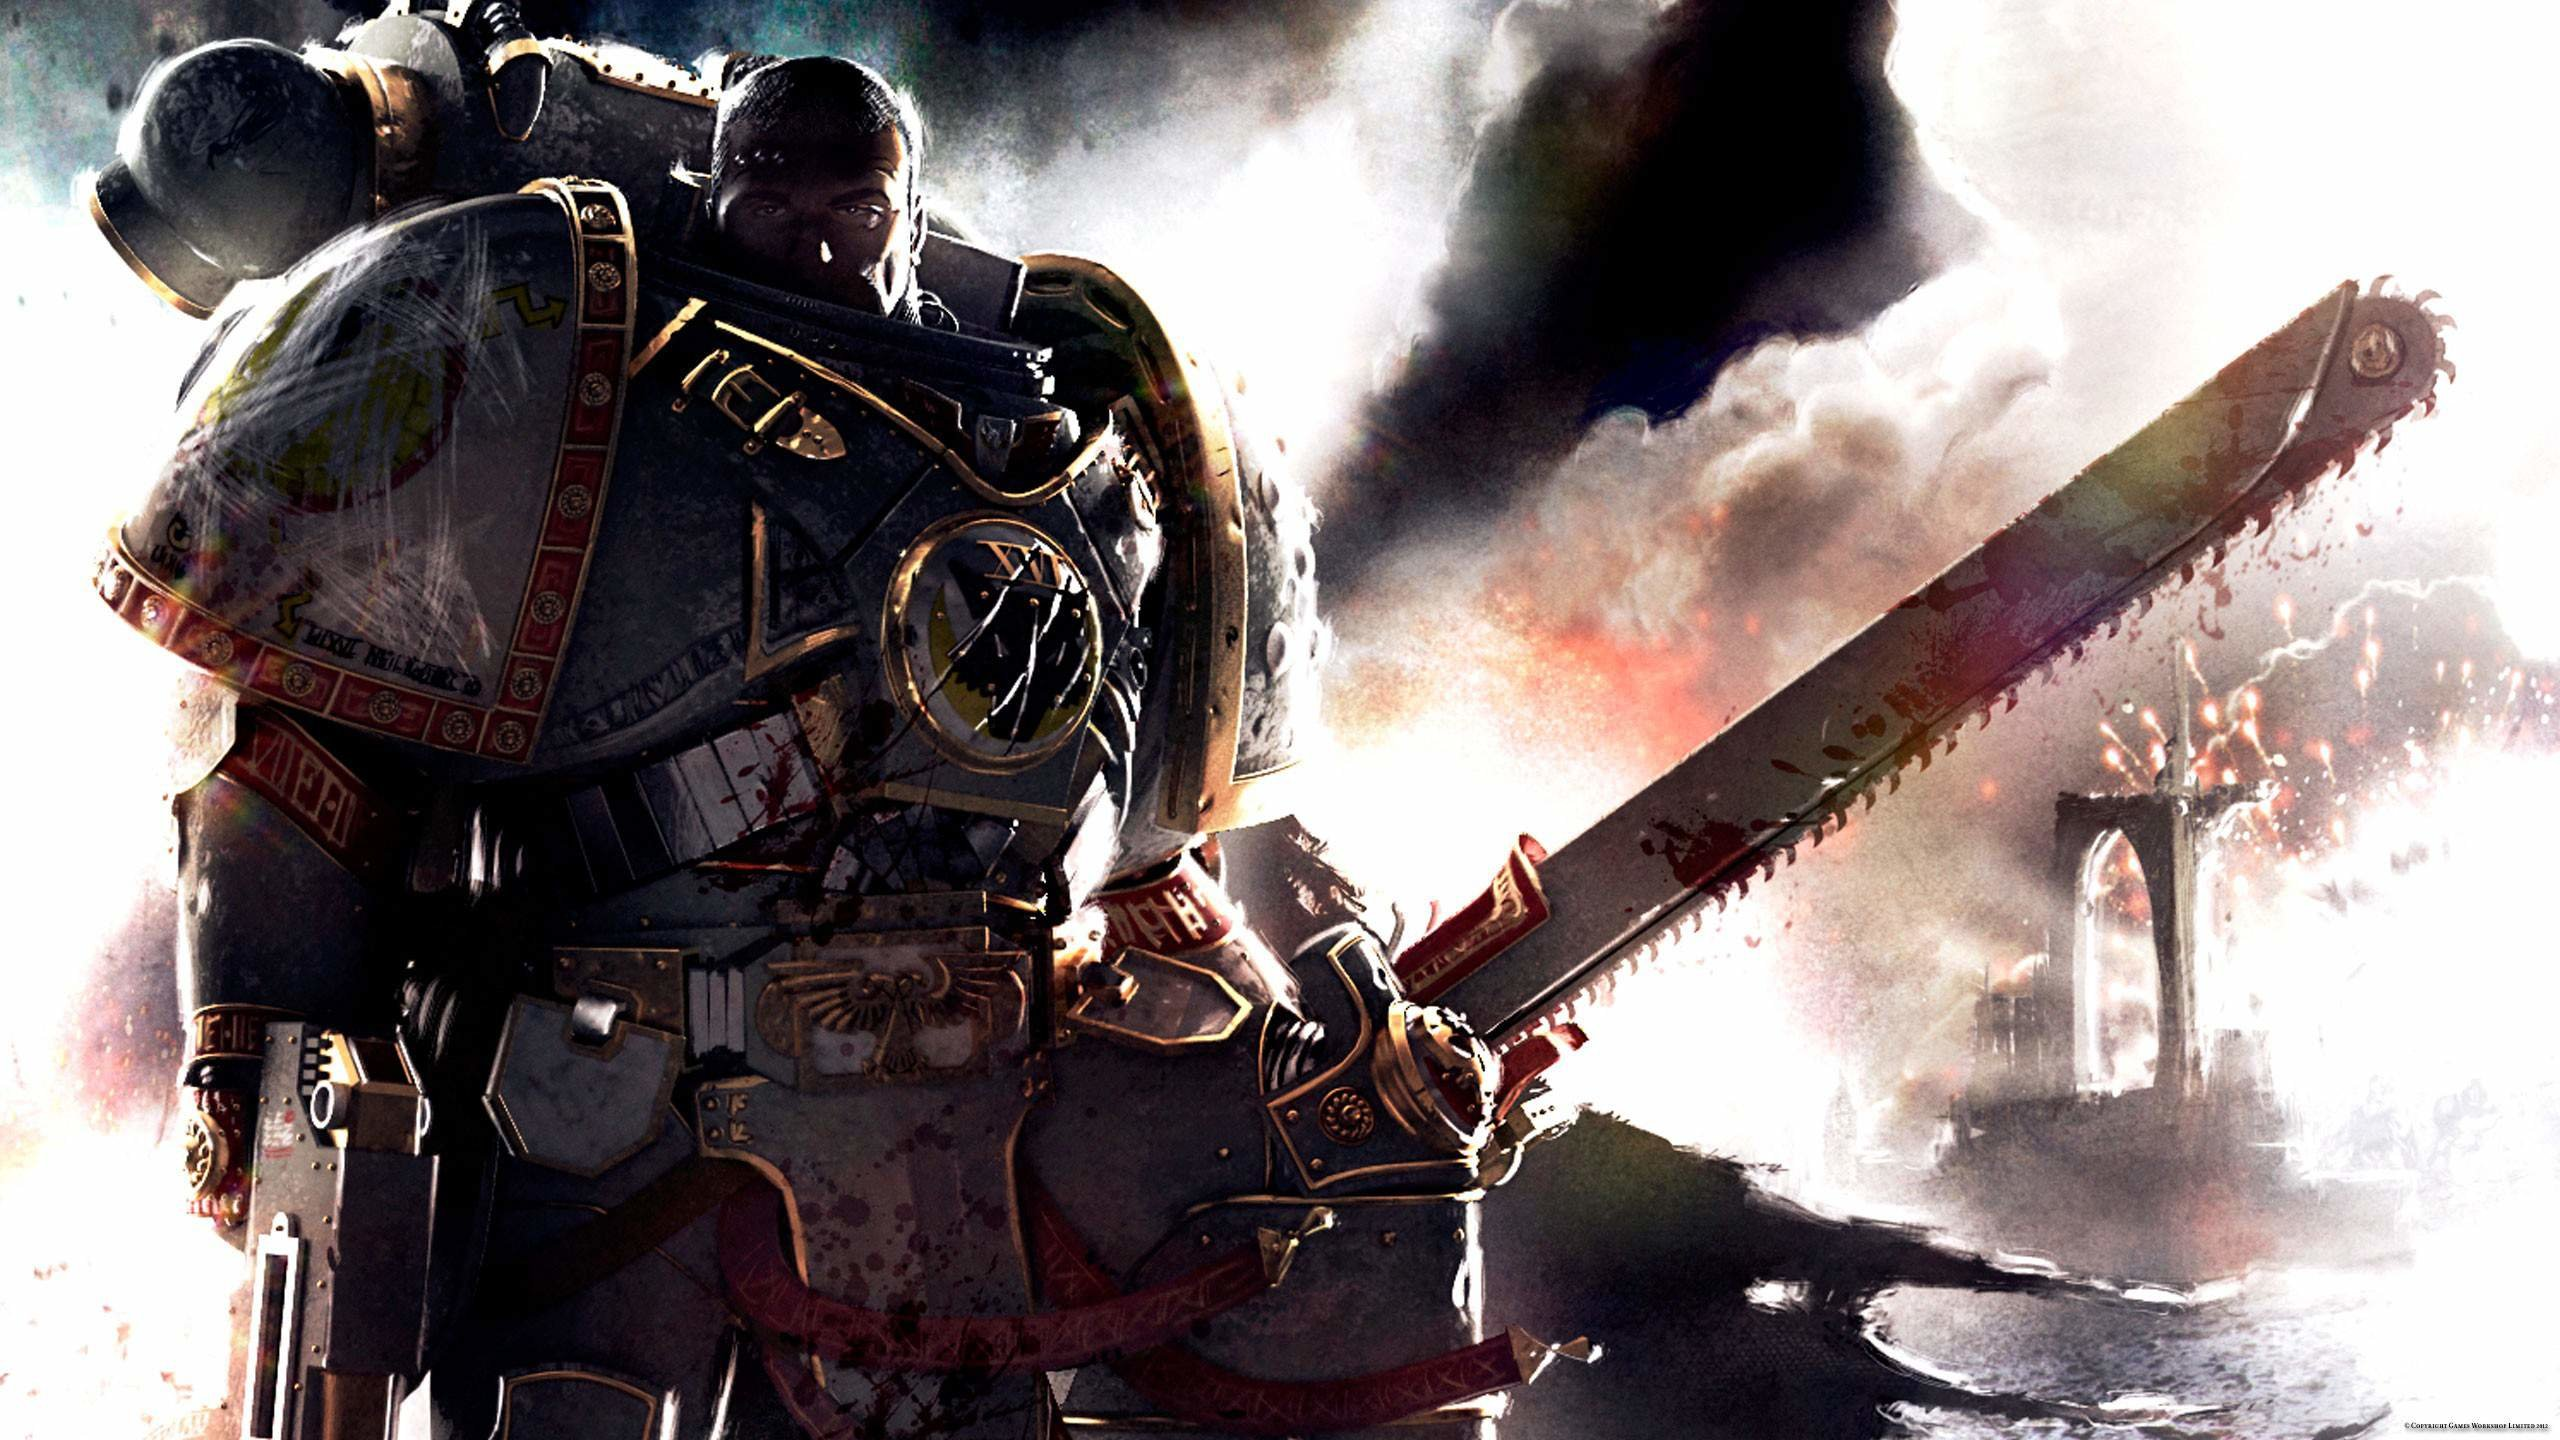 Warhammer 40k Wallpapers 2560x1440 Desktop Backgrounds